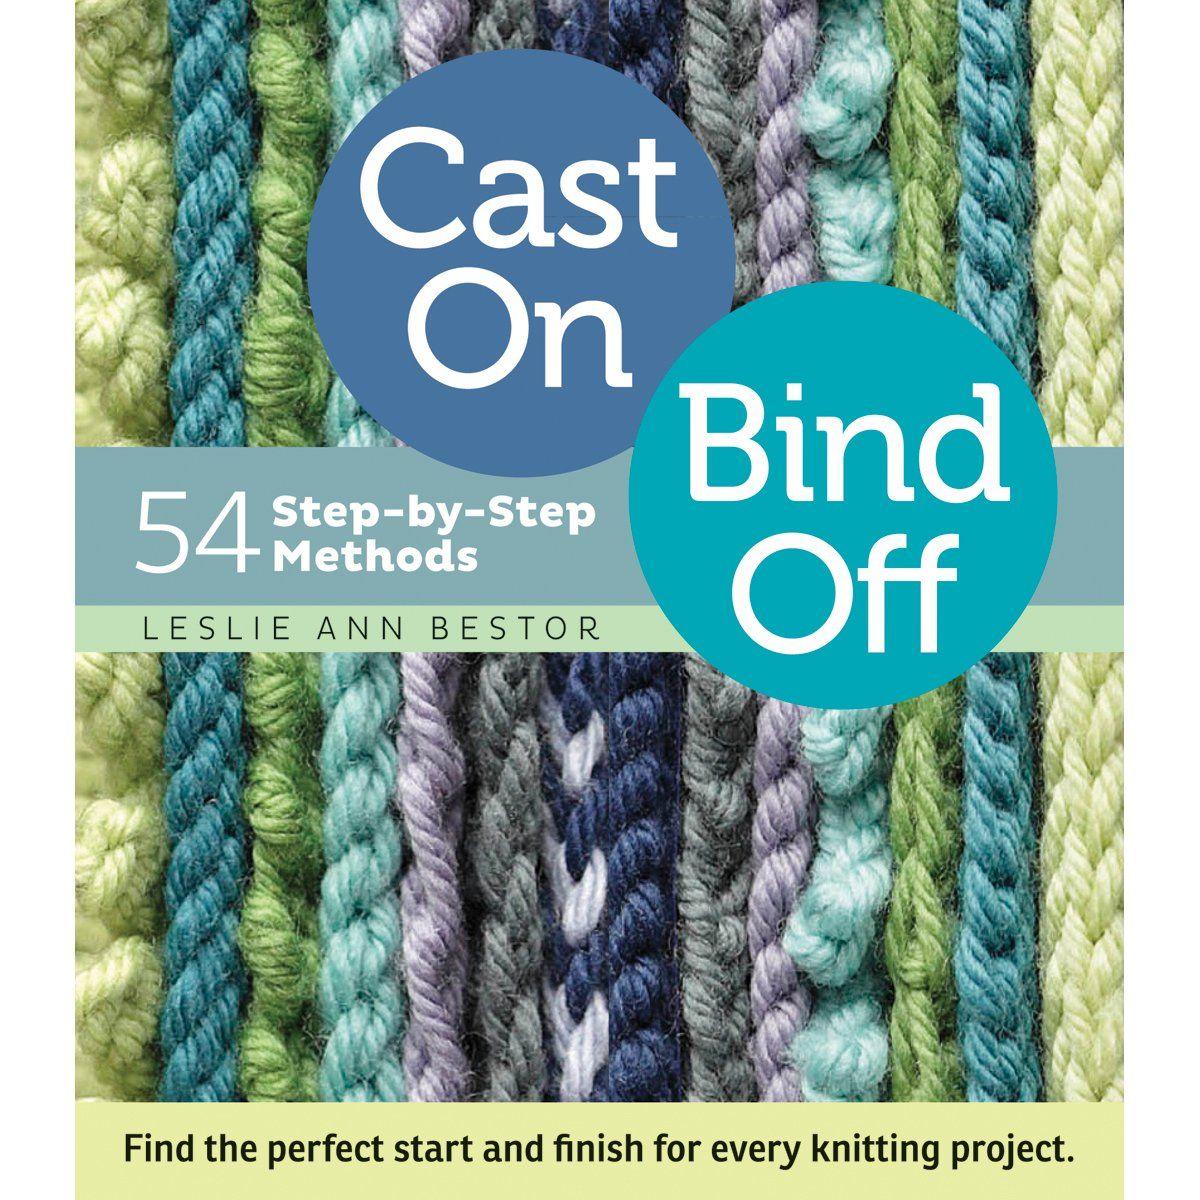 cast on bind off 54 step by step methods crochet knitting sewing bind off knitting. Black Bedroom Furniture Sets. Home Design Ideas